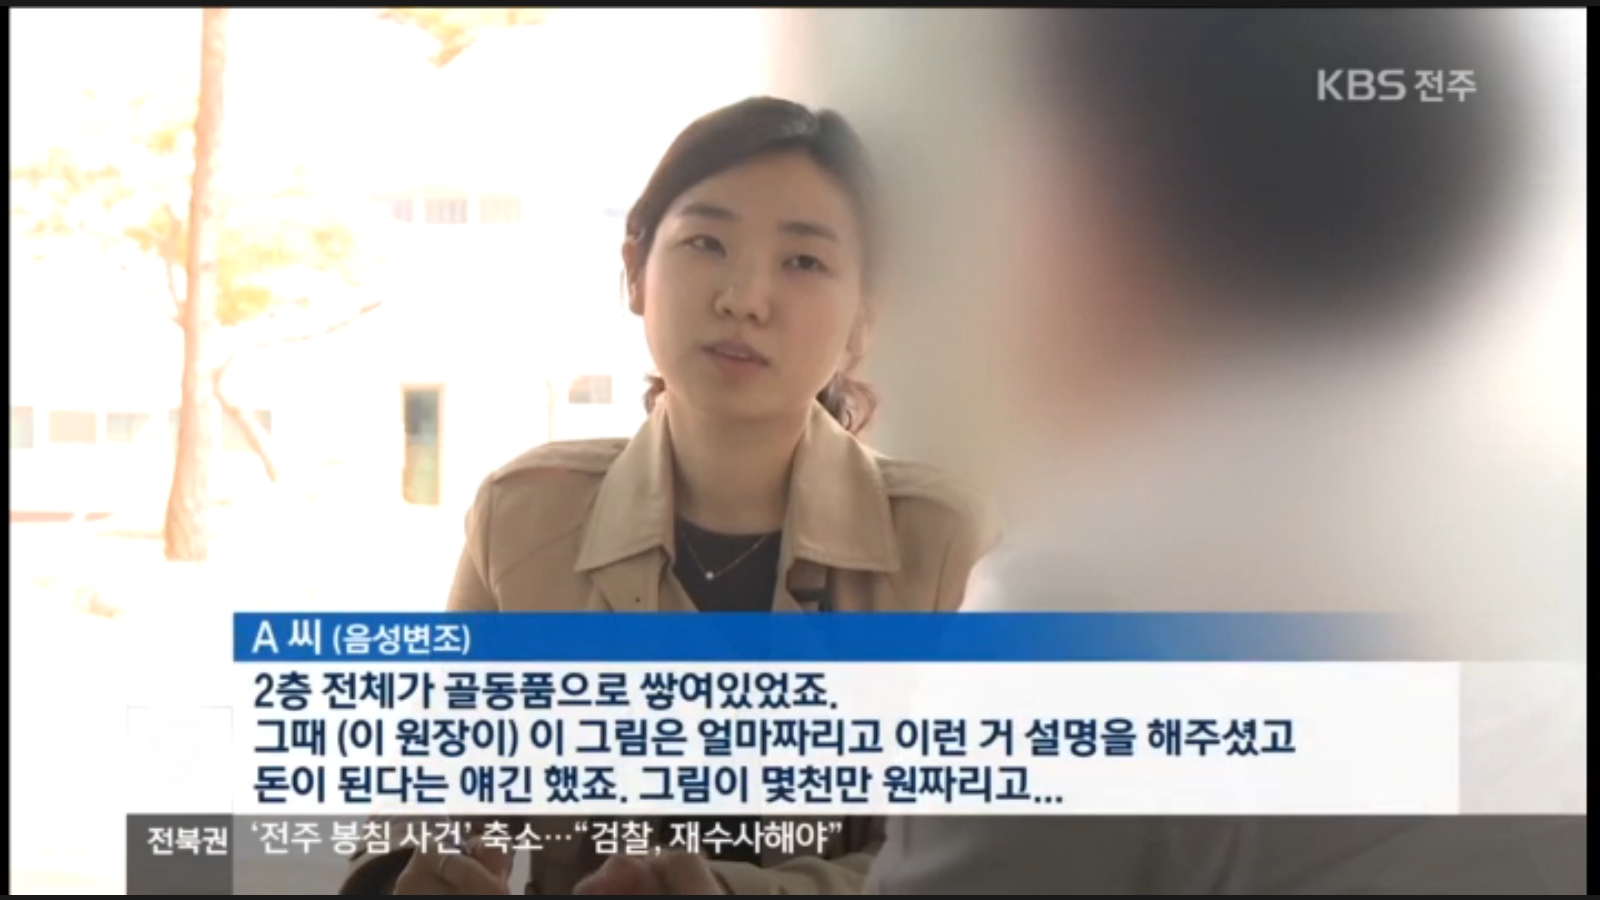 [18.3.30 KBS전주] 전주 봉침게이트, 재산 형성은..후원금검찰 사건축소..재수사 해야6.jpg